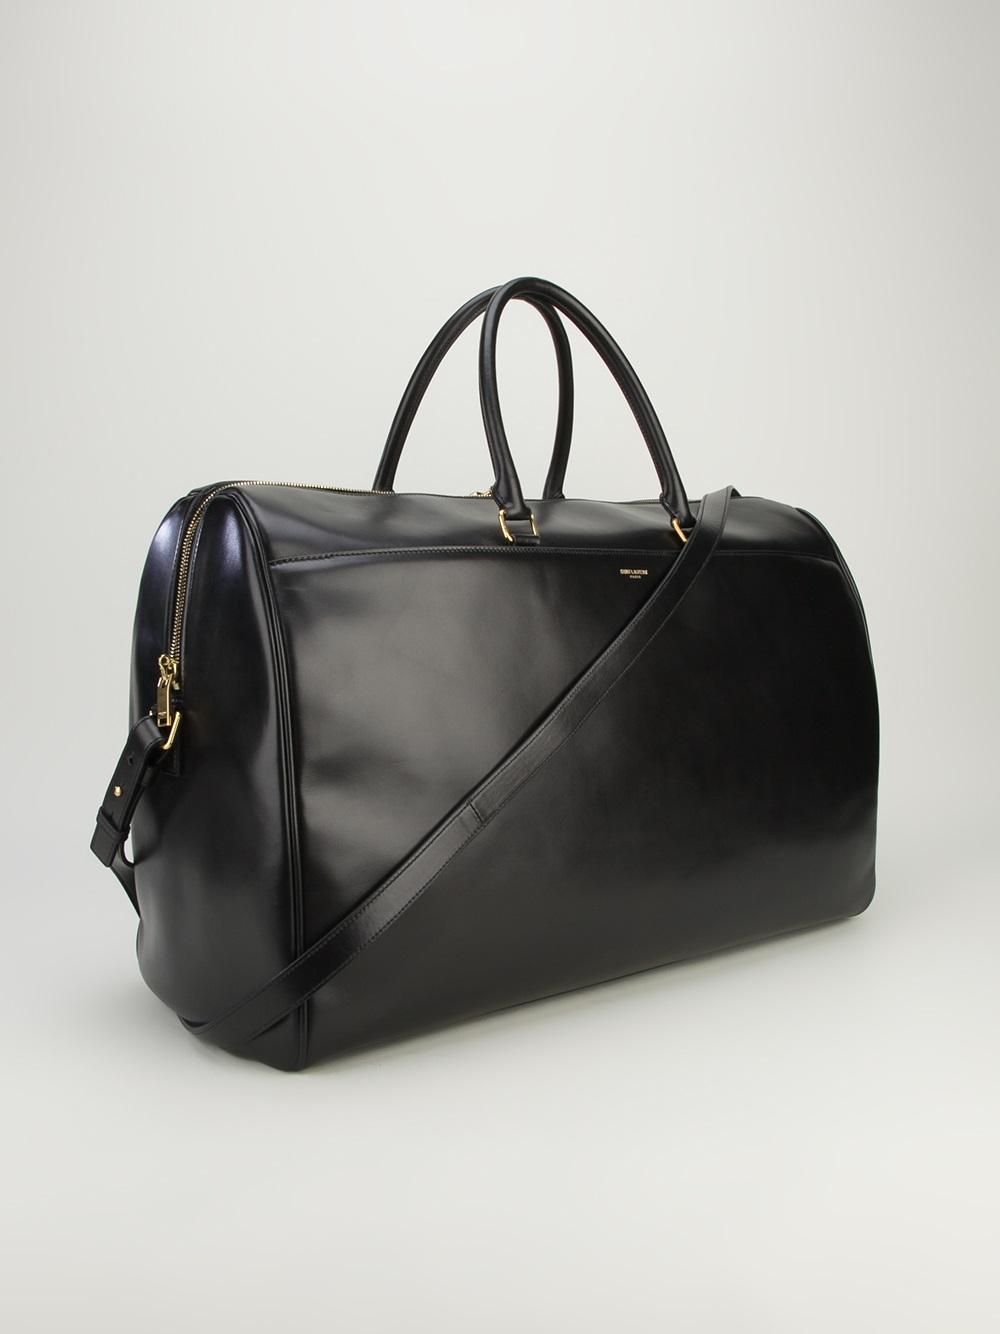 310fdccc2bf1 Lyst - Saint Laurent Duffle Bag in Black for Men